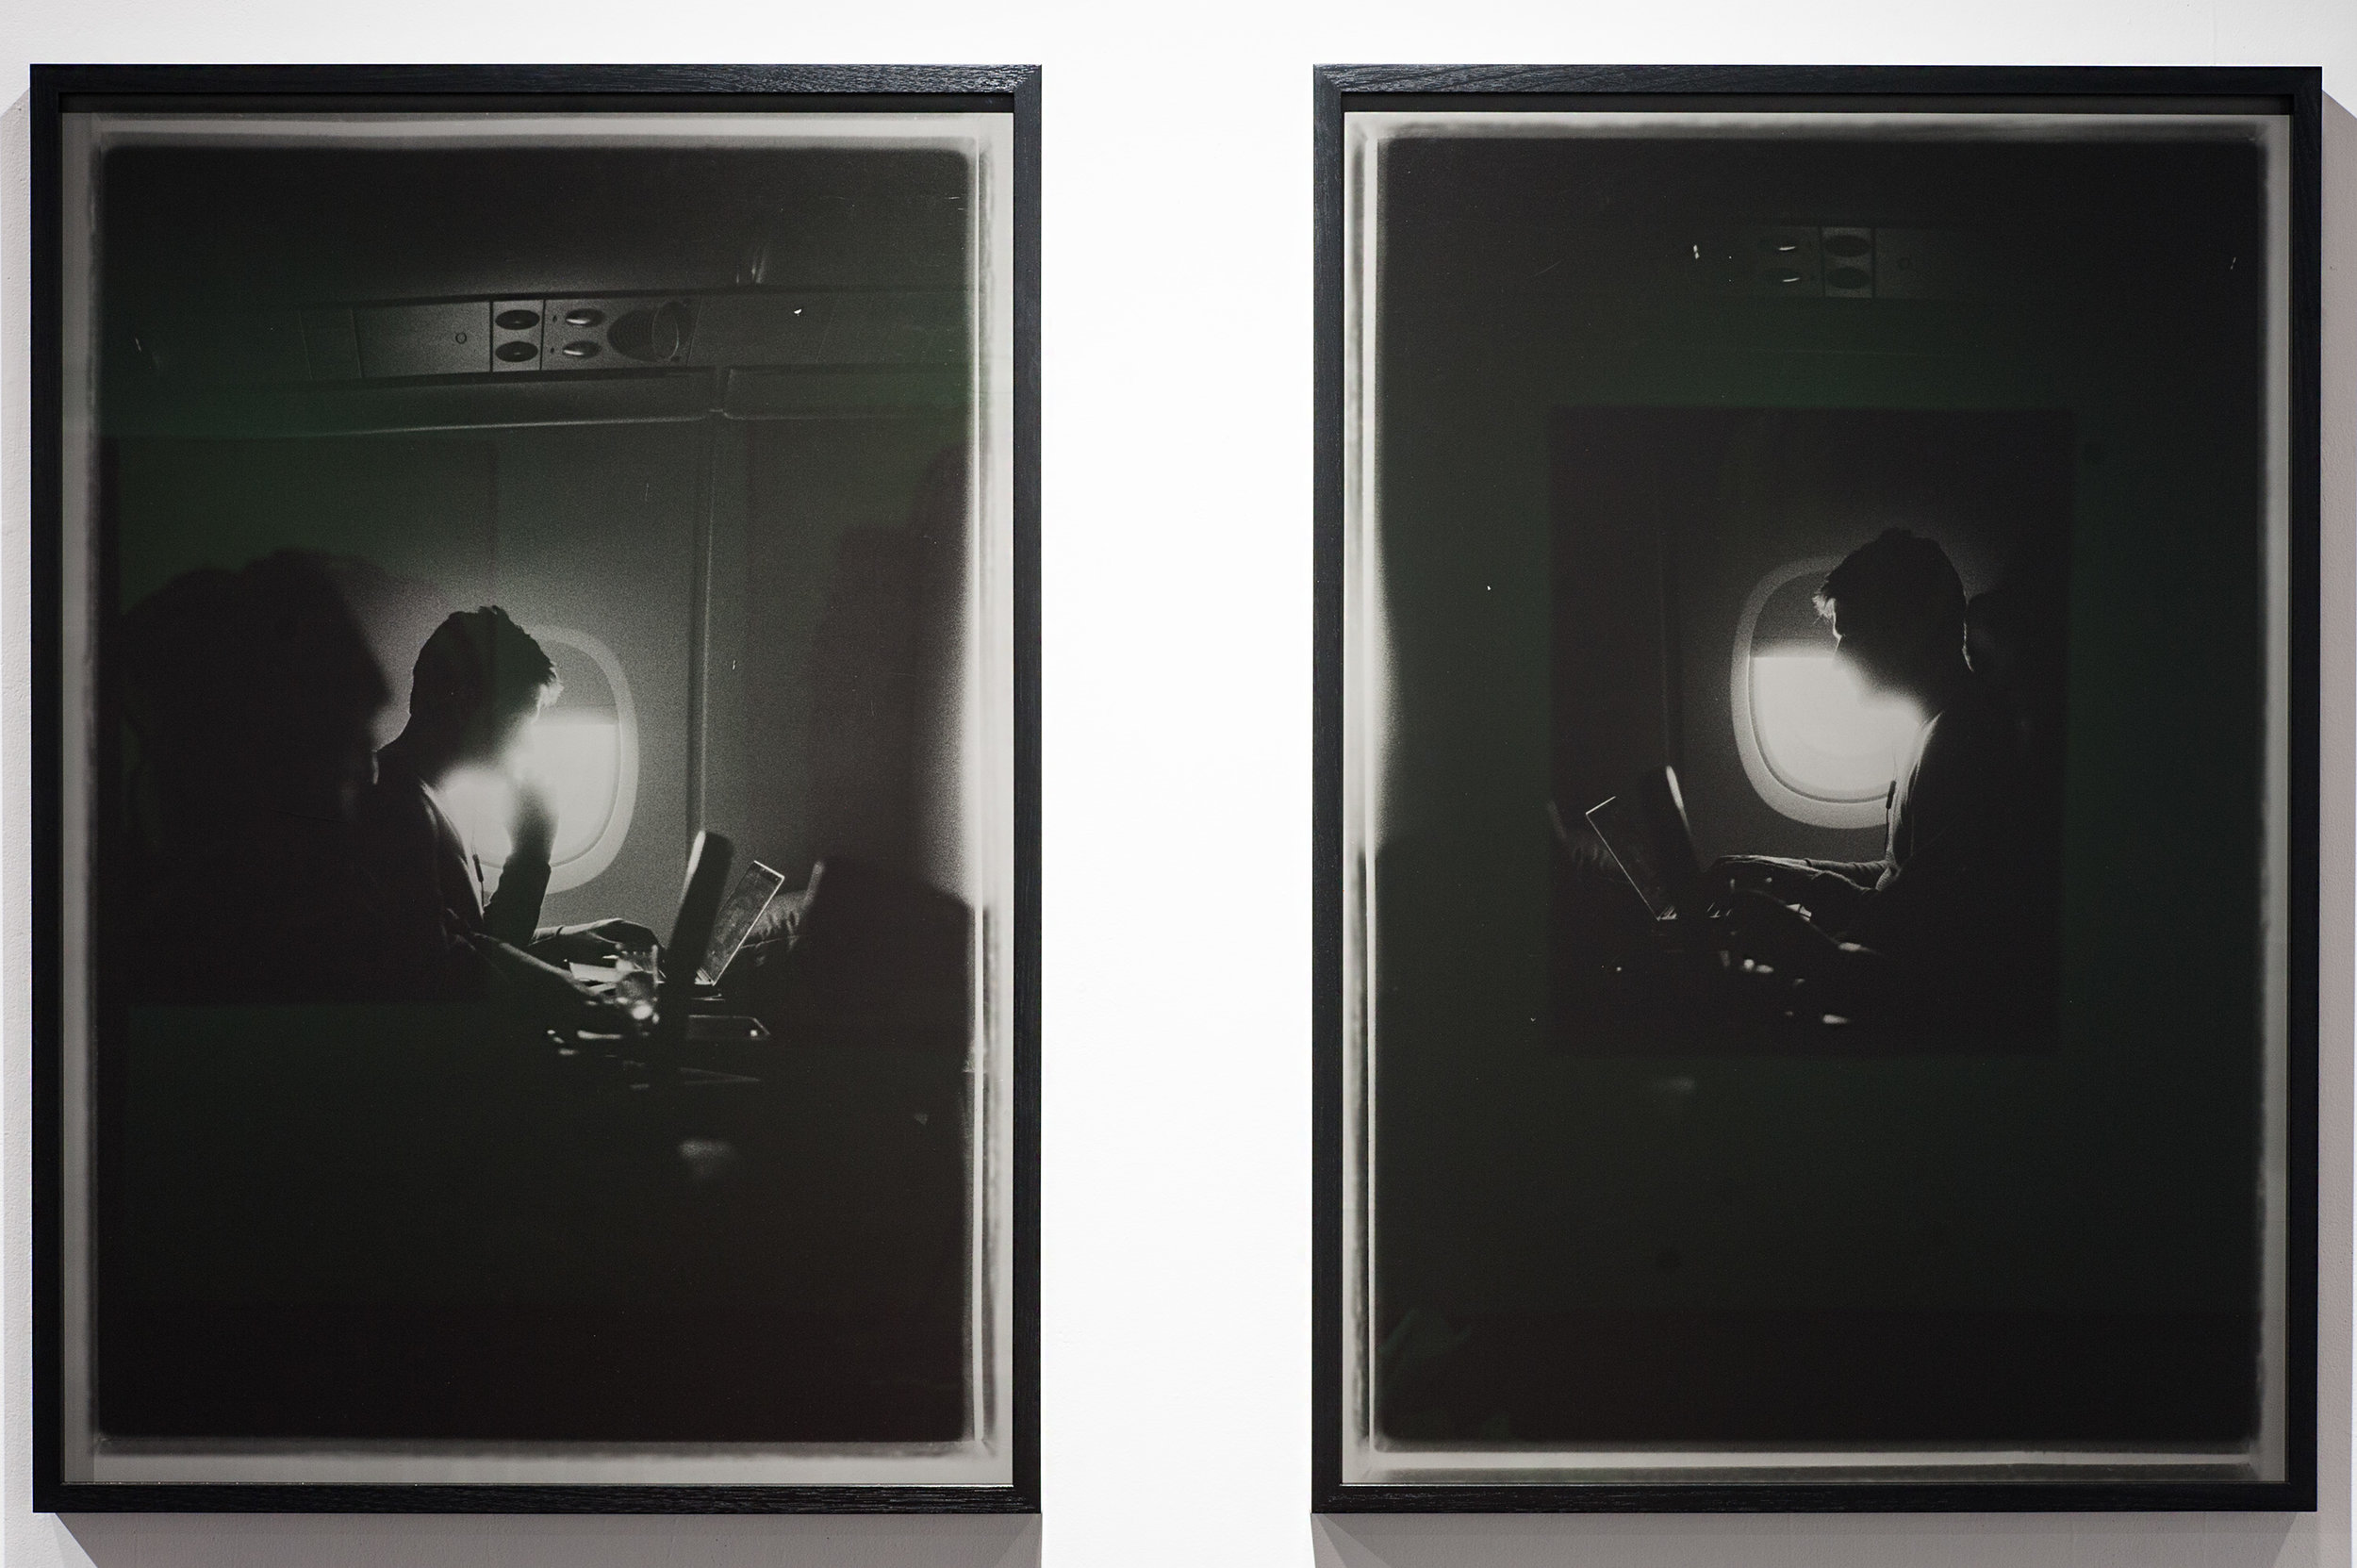 Drift 1  hand printed silver gelatin fogged black and white photograph 121 x 83cm 2015   Drift 2  hand printed silver gelatin fogged black and white photograph 121 x 83cm 2015